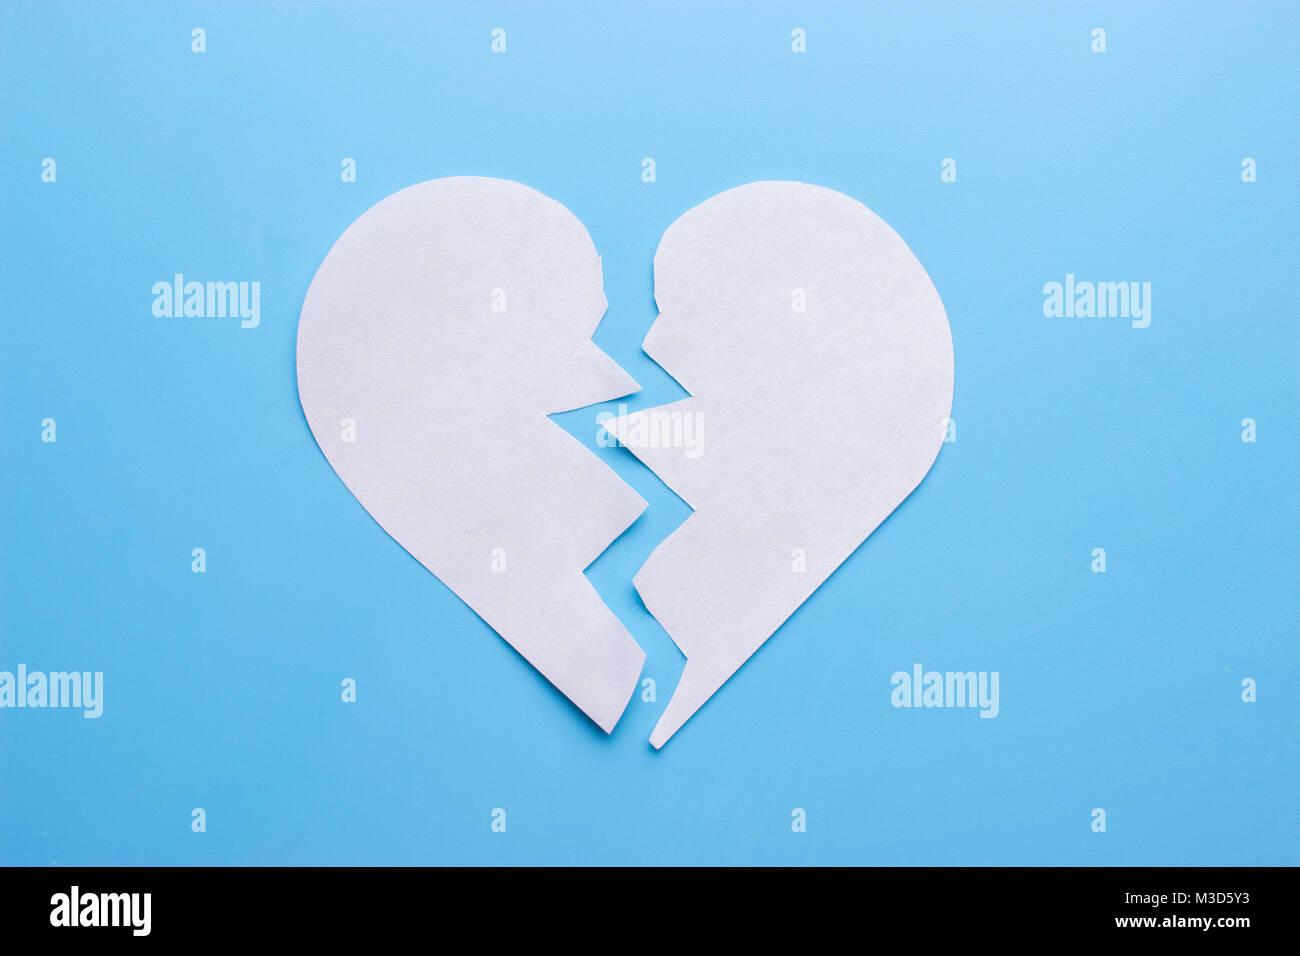 Broken heart on blue background. breakup concept - Stock Image